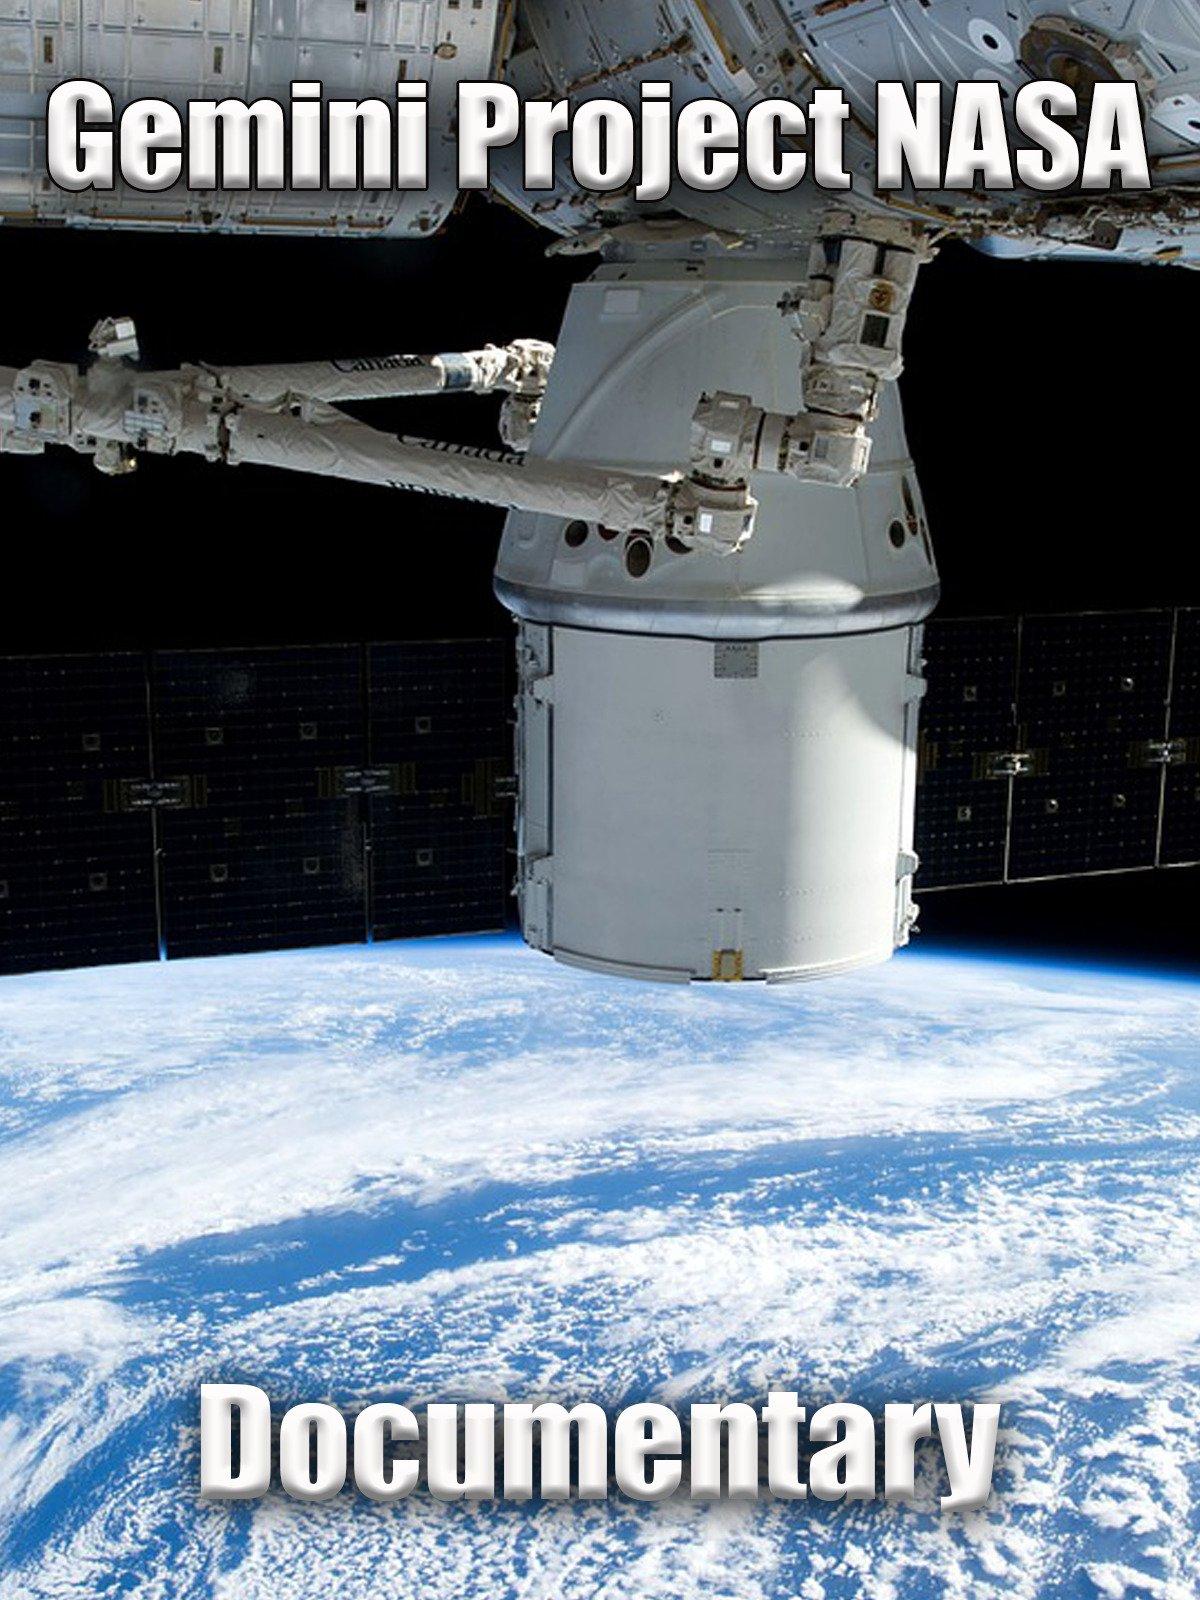 Gemini Project NASA: Documentary